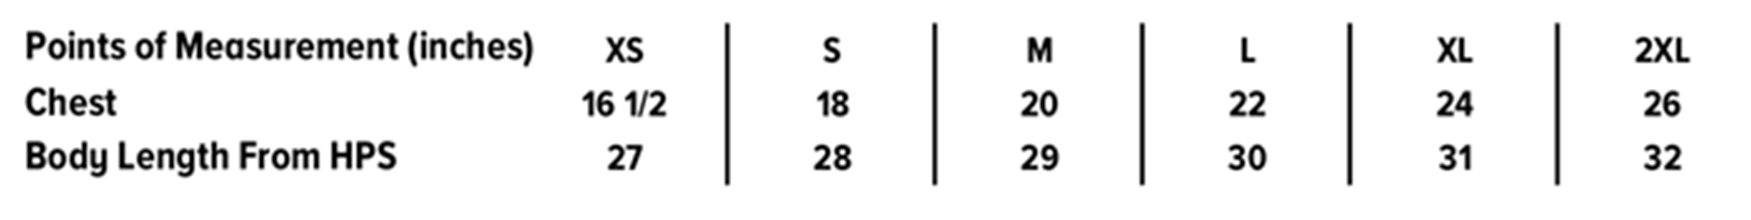 shirt-measurements3-1579205173-43c.jpg